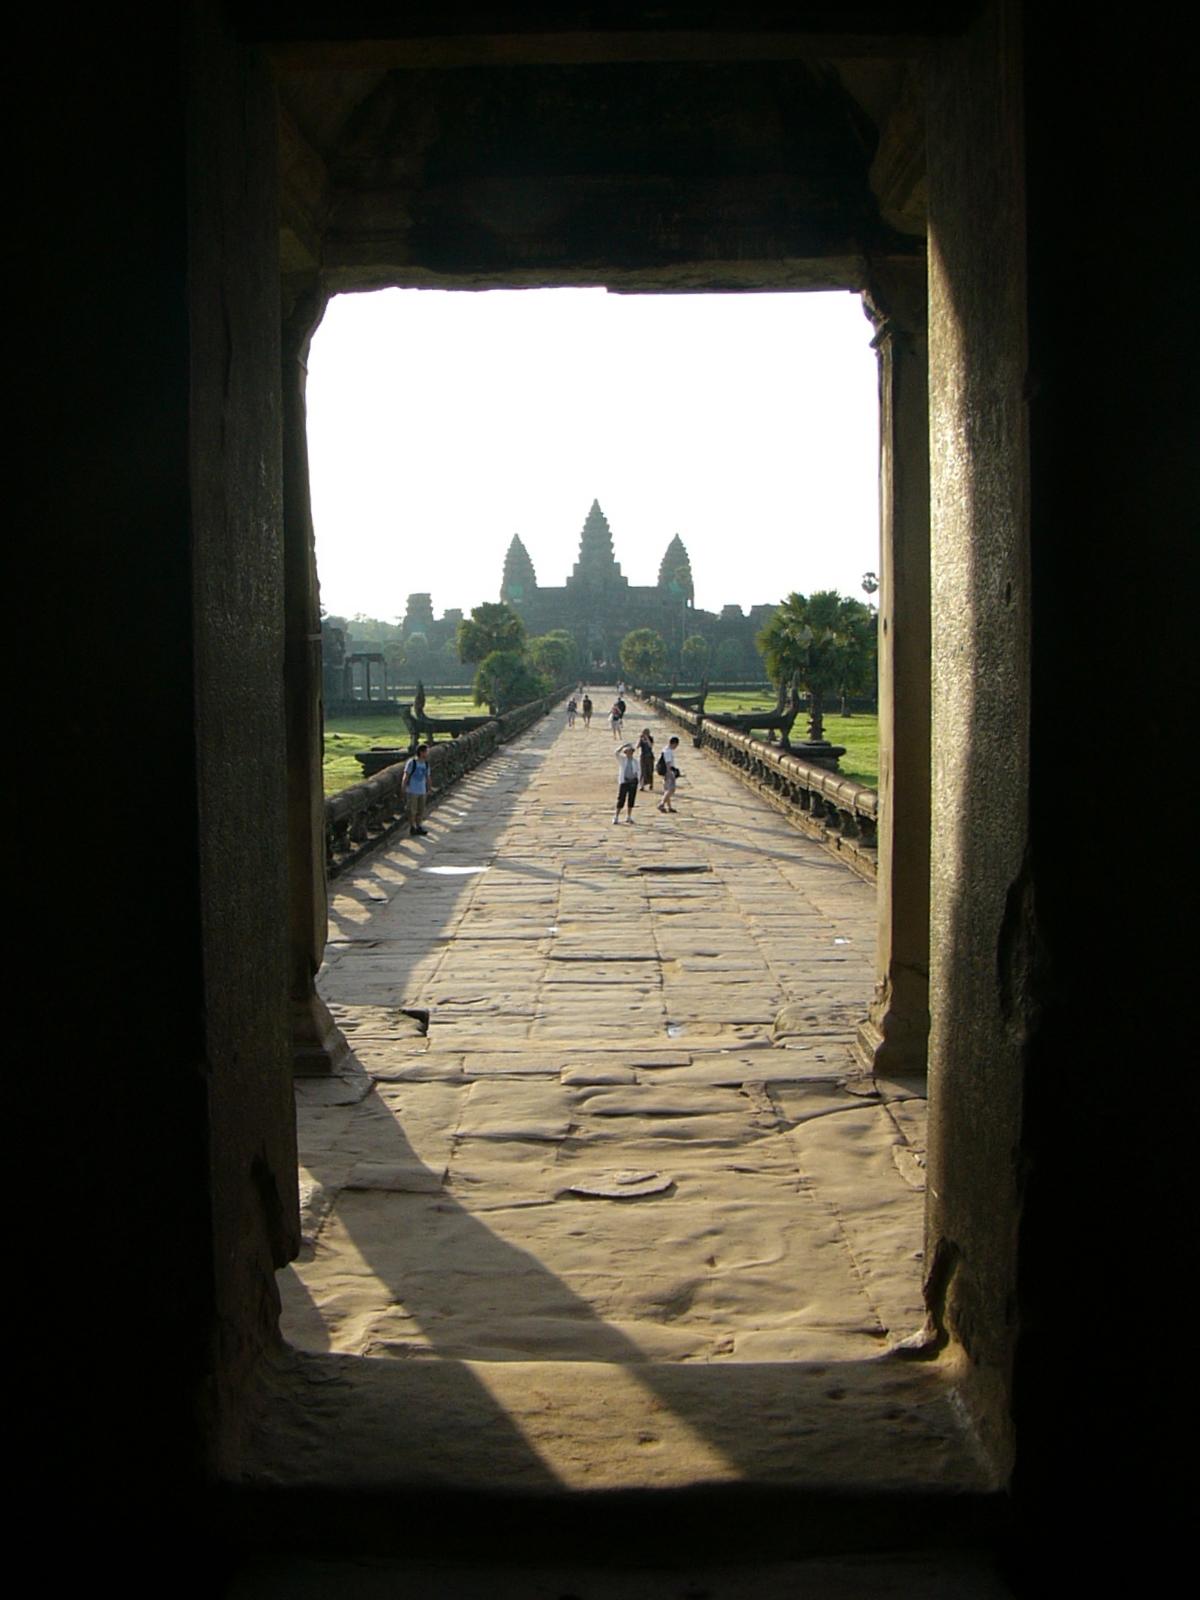 Enter Angkor Wat